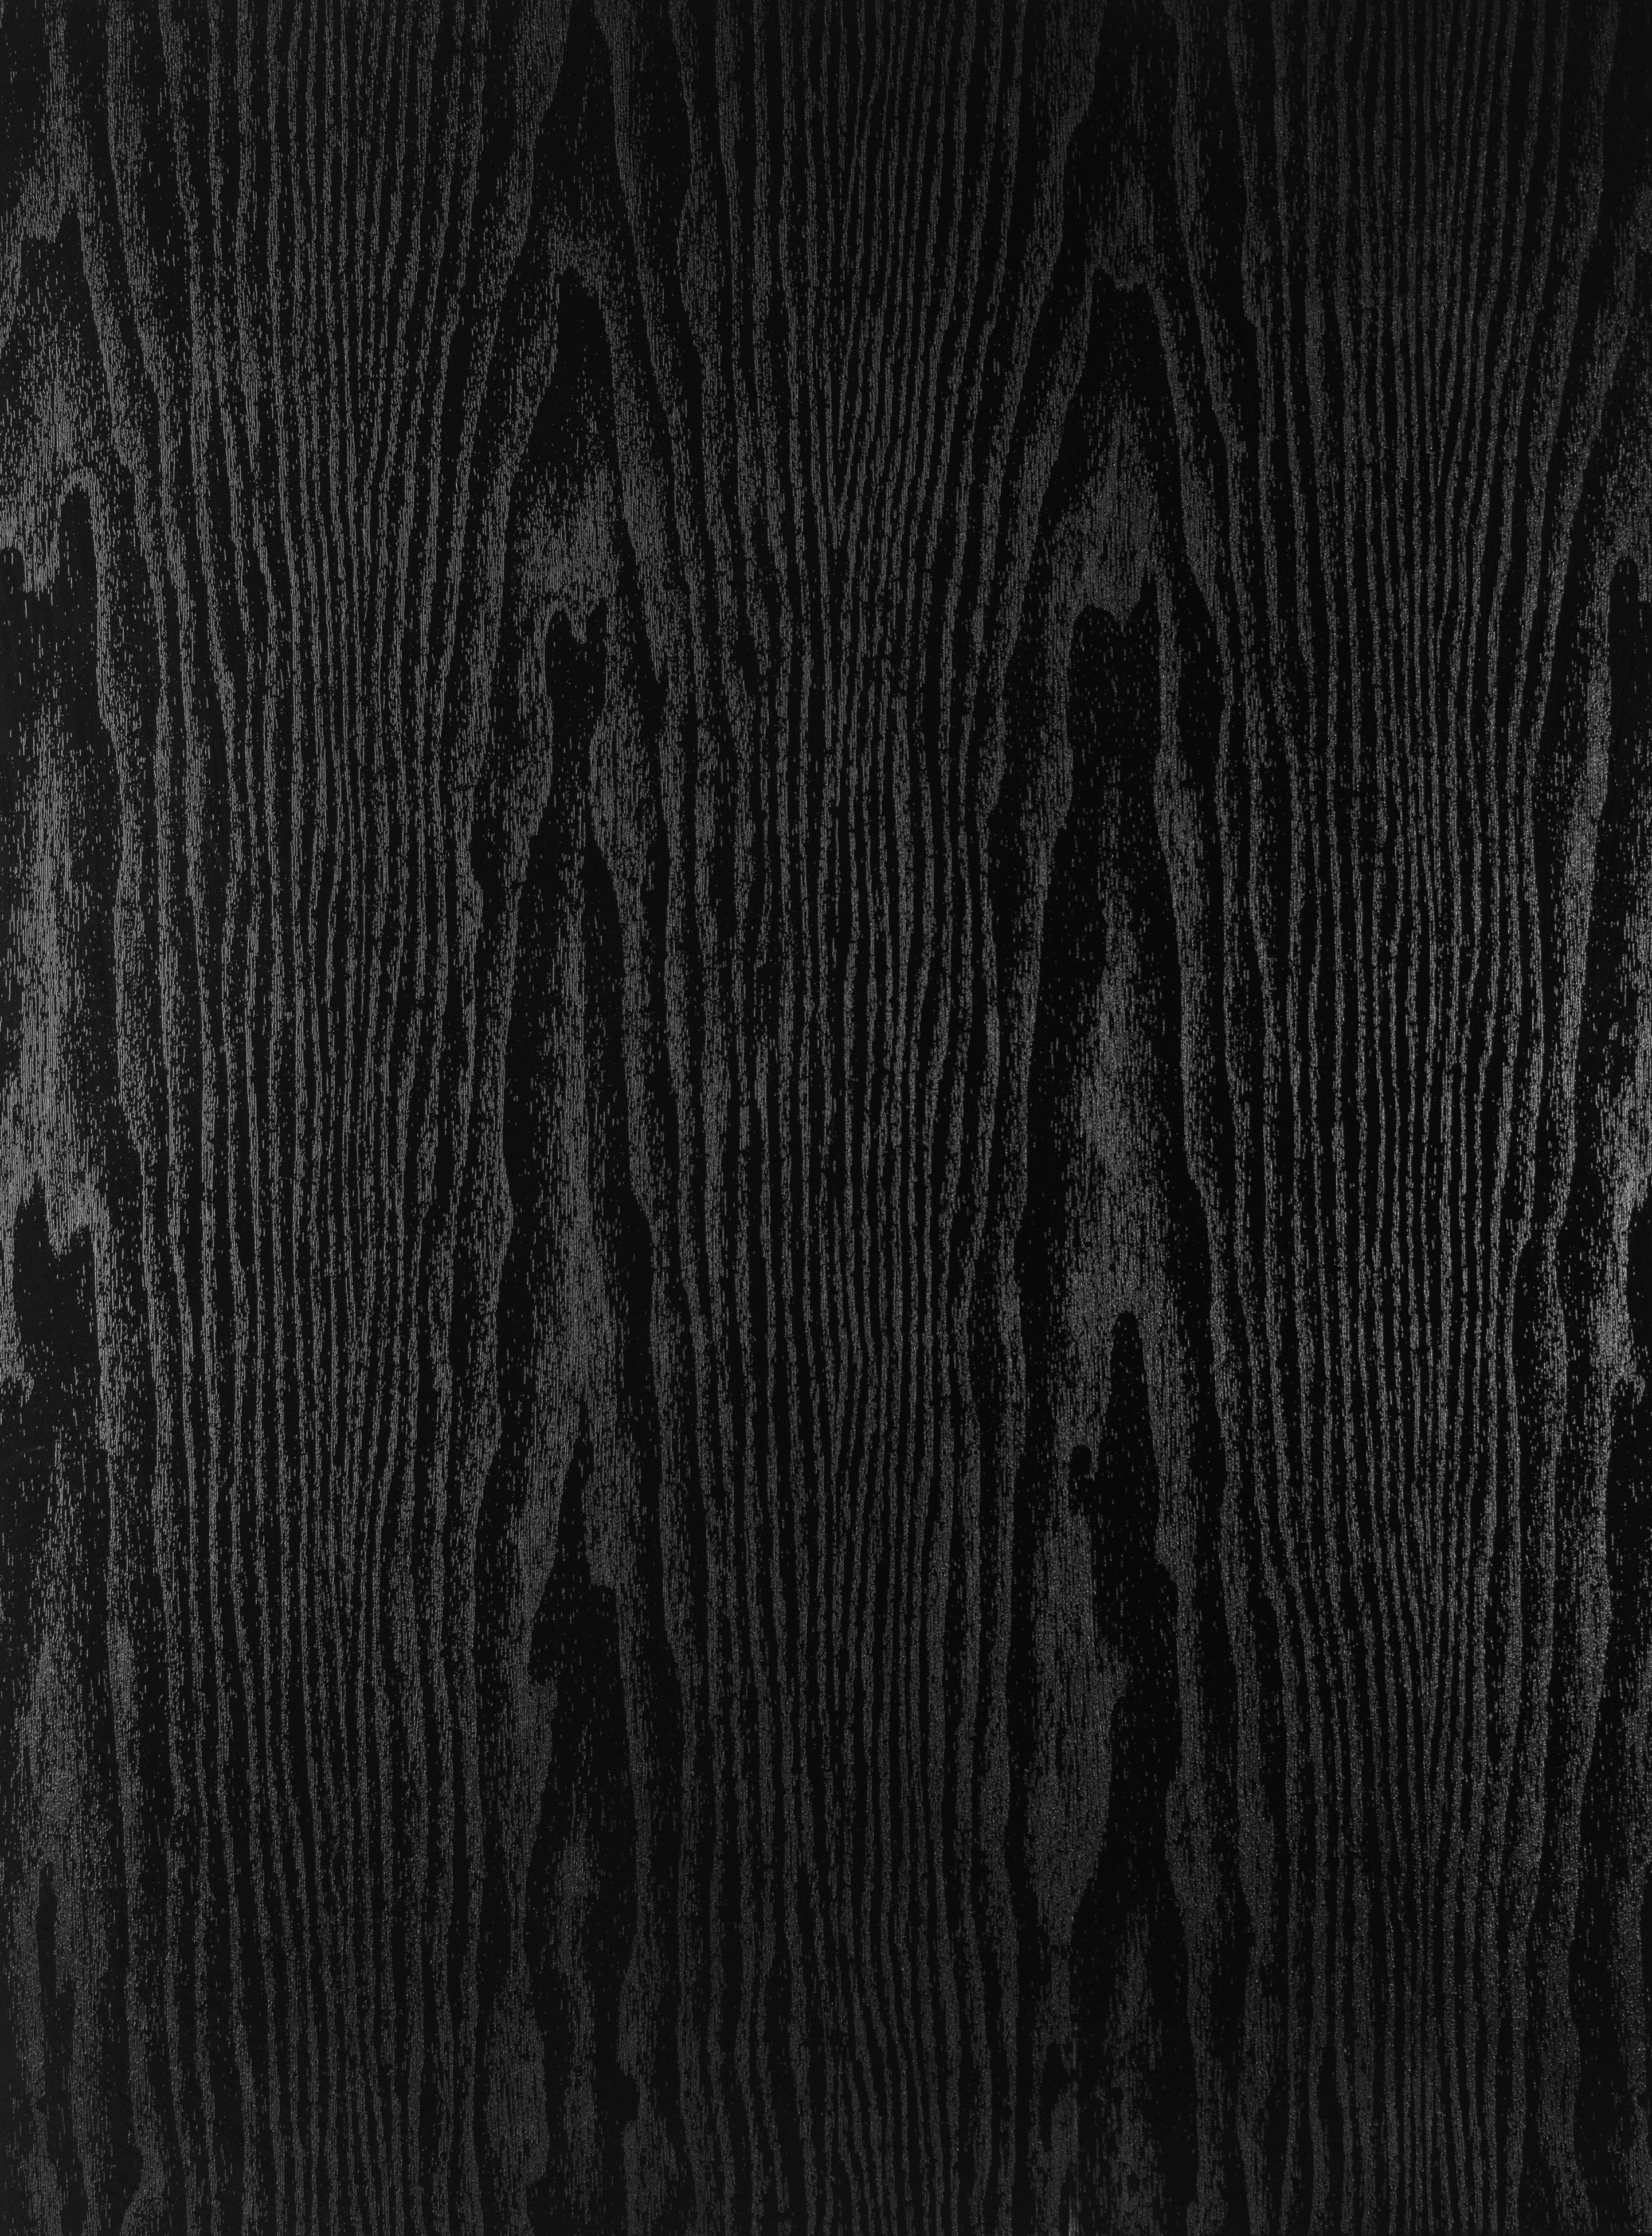 Ebony Wood Grain Blake Surface Solutions